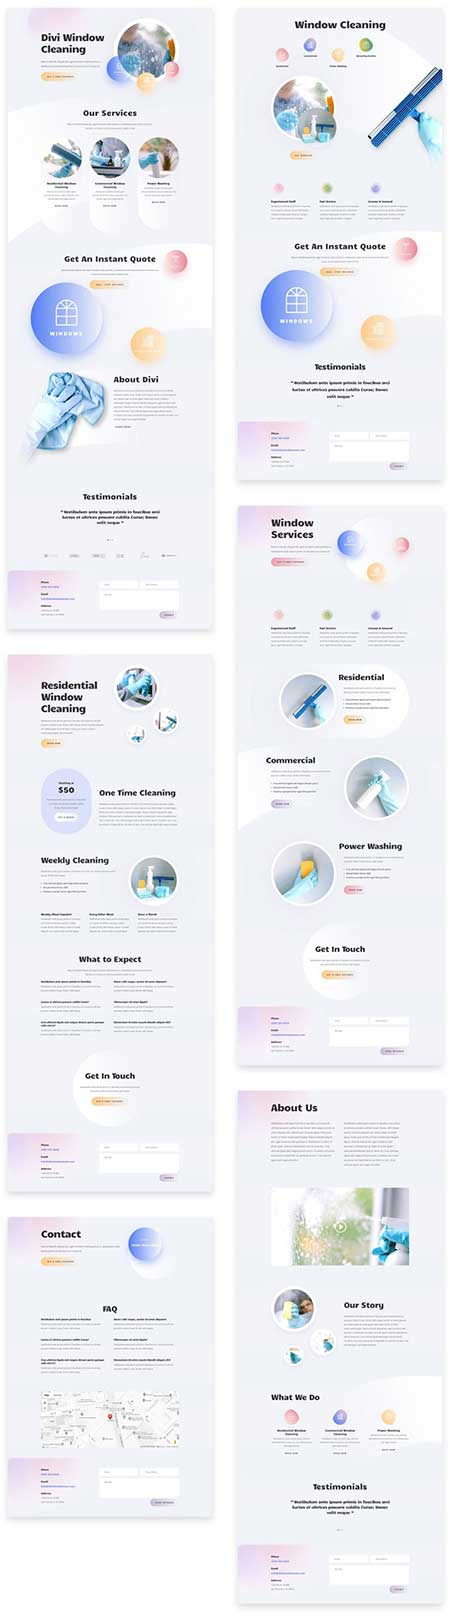 Divi window cleaners website layouts